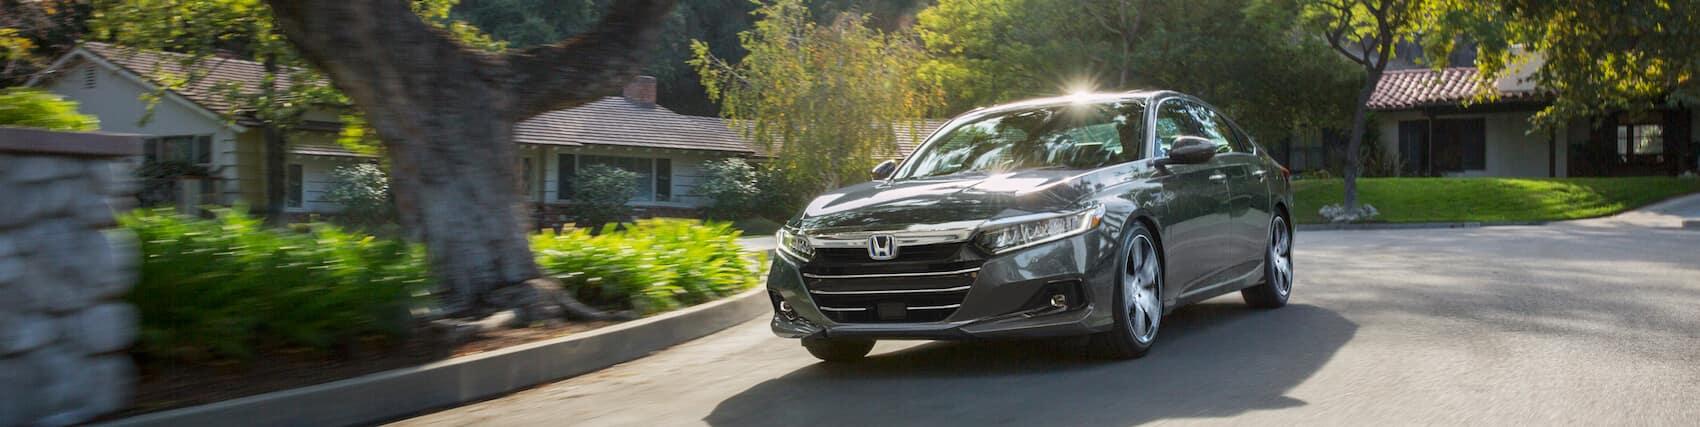 Honda Accord Specials near Venice, FL